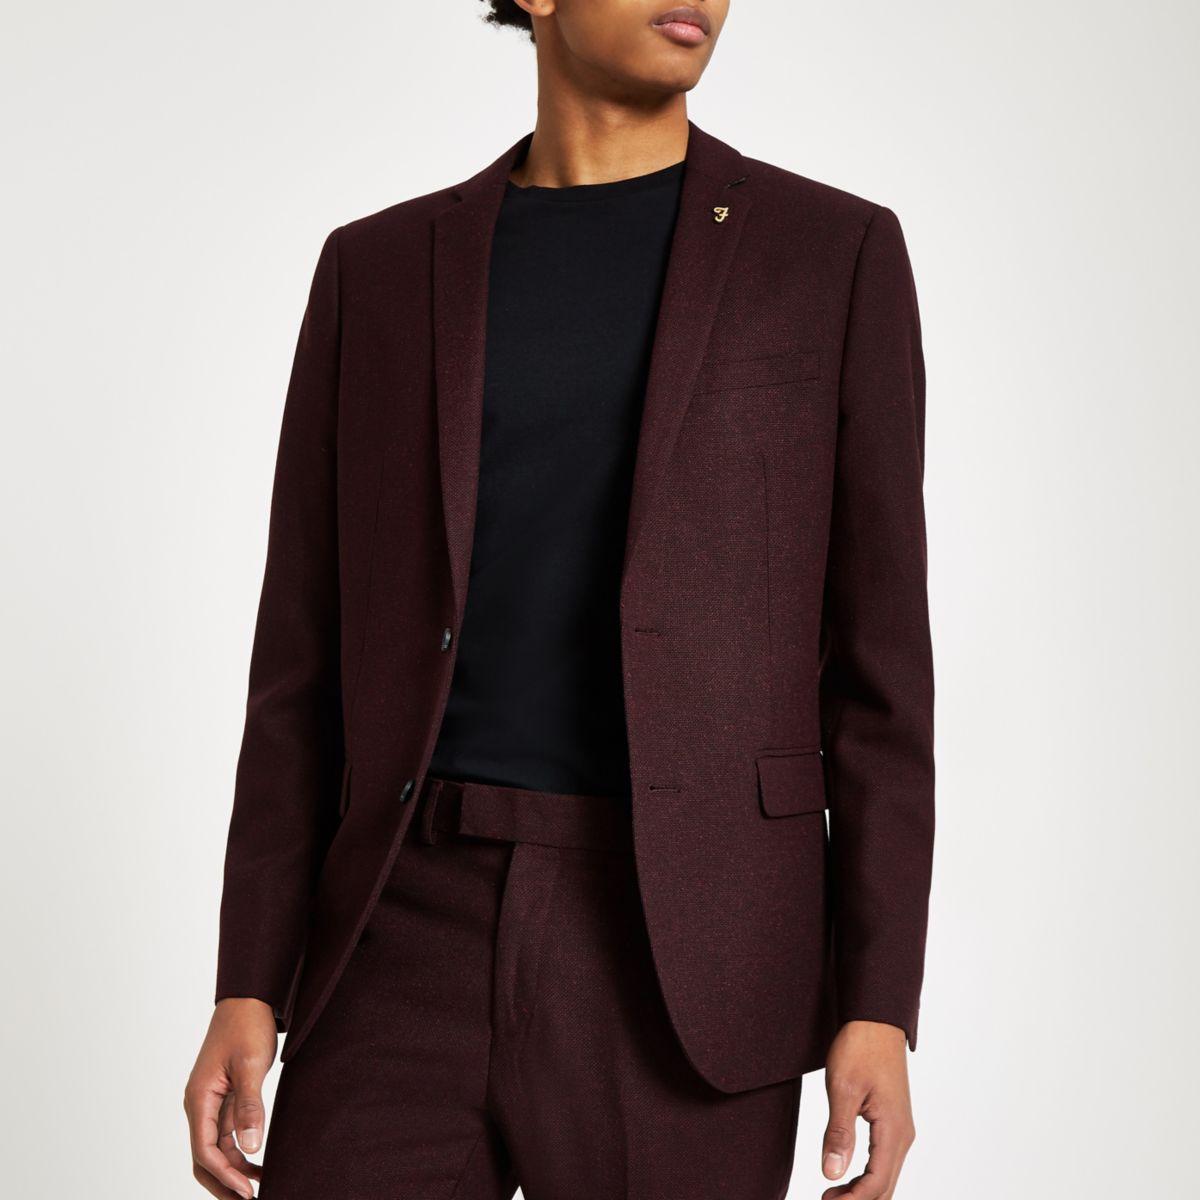 Farah burgundy hopsack suit jacket